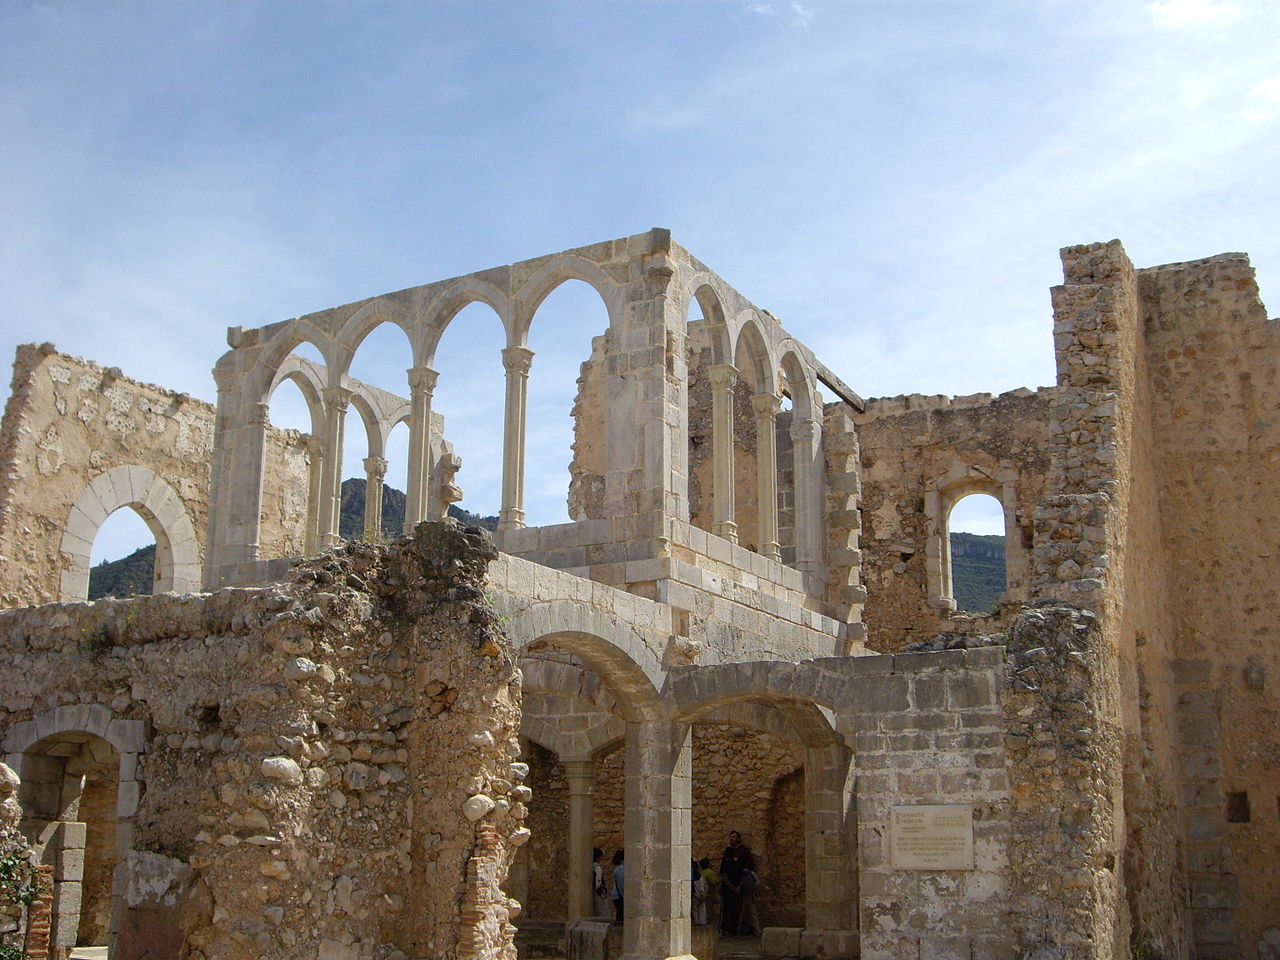 palacio del abad valldigna